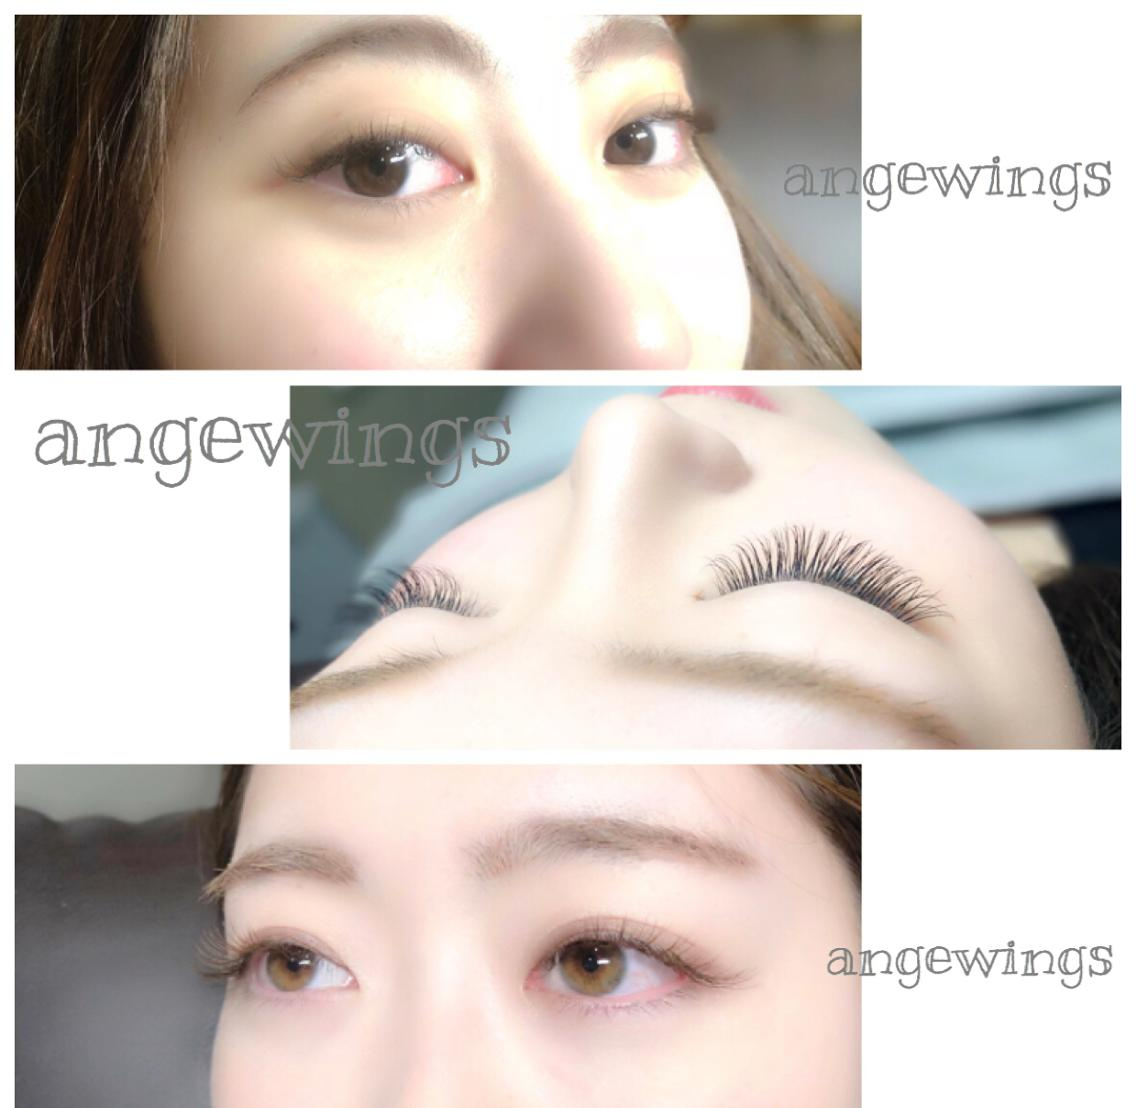 angewings × hairMission所属・高松星莉南の掲載